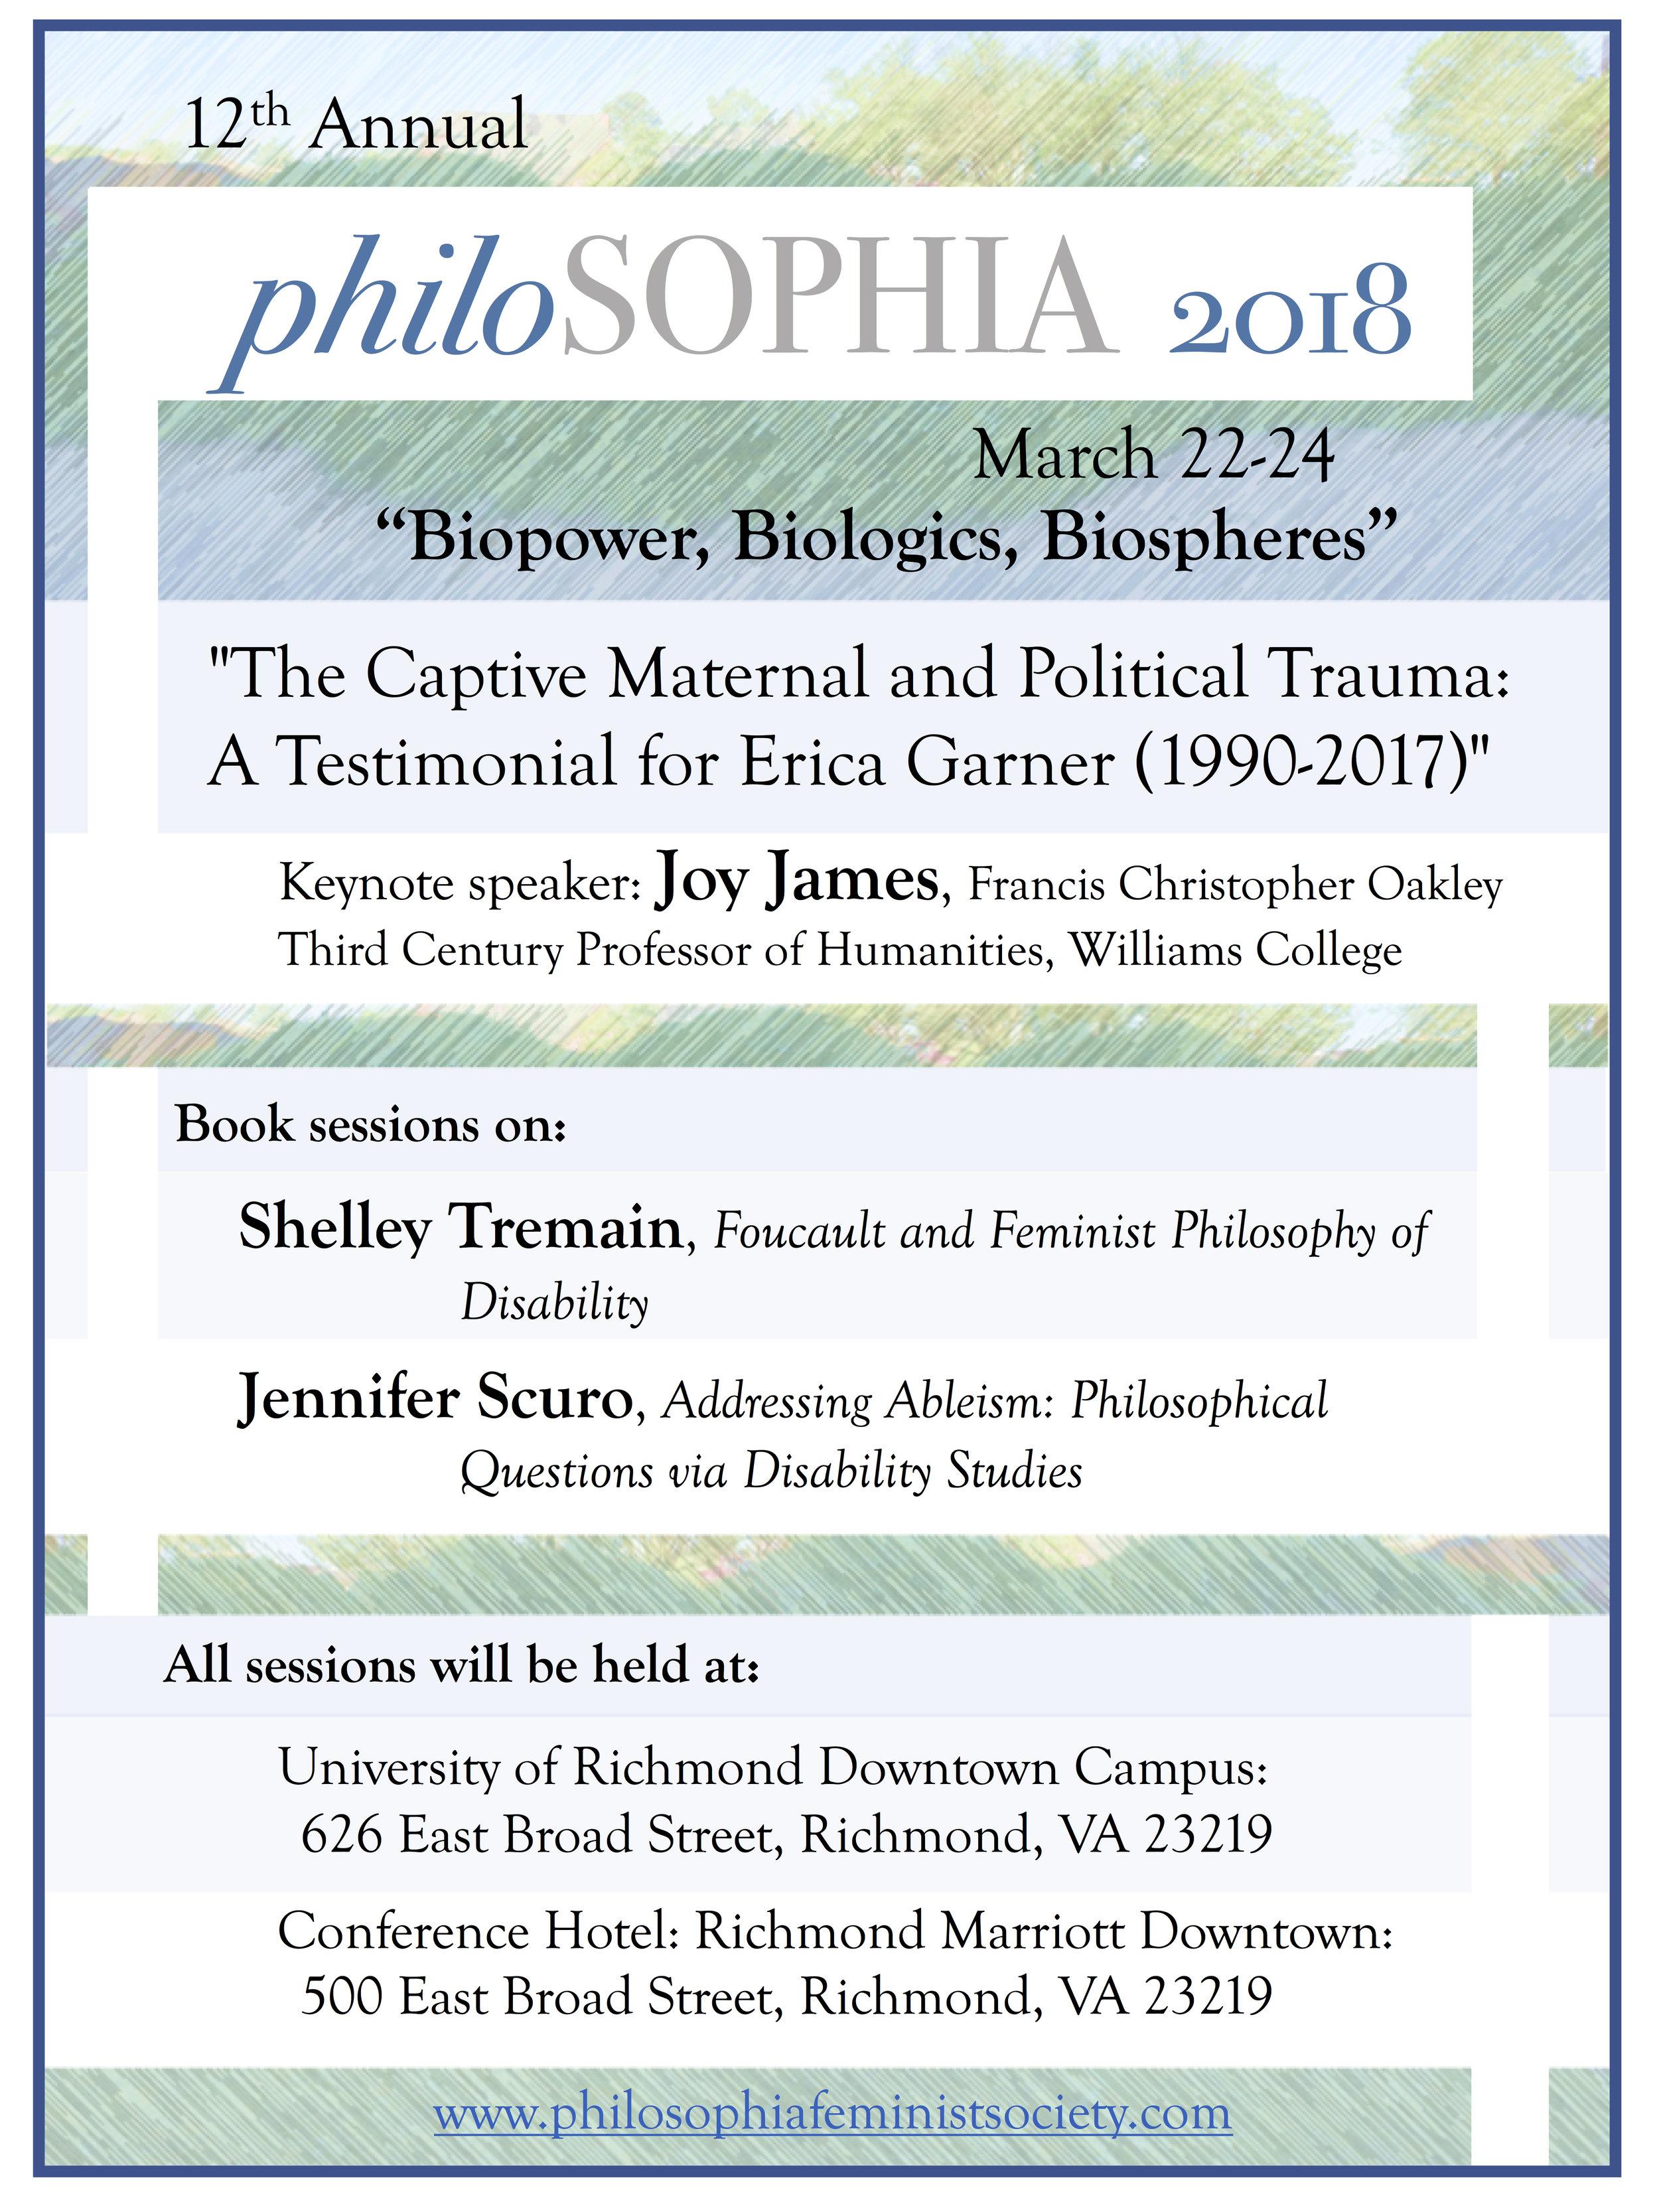 philoSOPHIA 2018 Conference flyer distributed digital.jpg